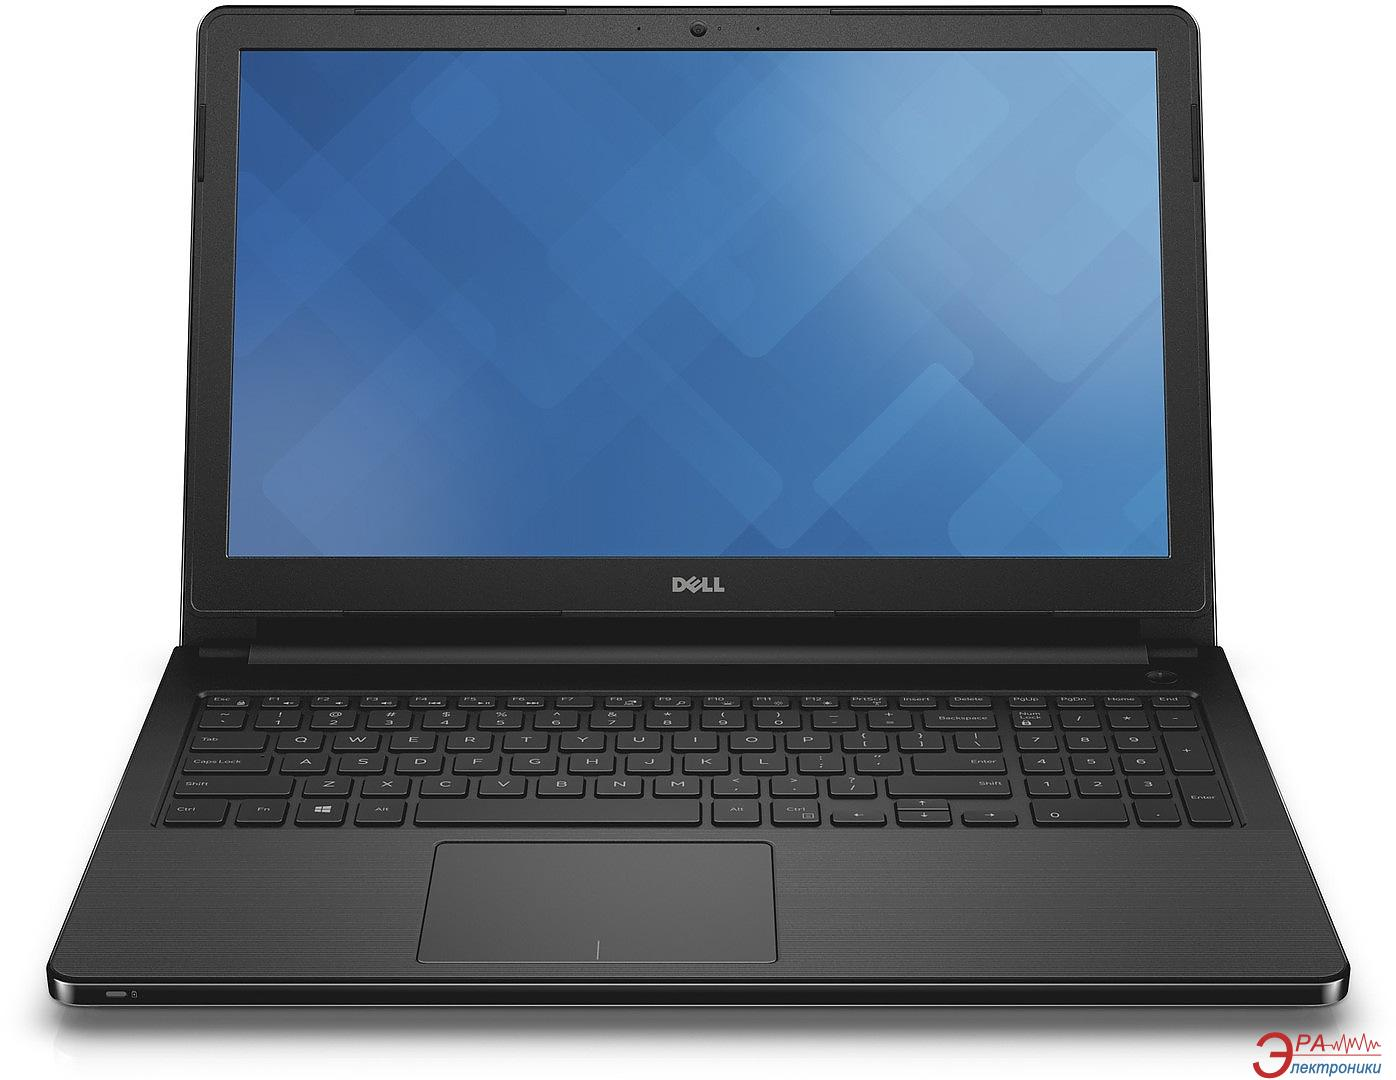 Ноутбук Dell Vostro 3558 (VAN15BDW1701_018_R_WIN) Black 15,6